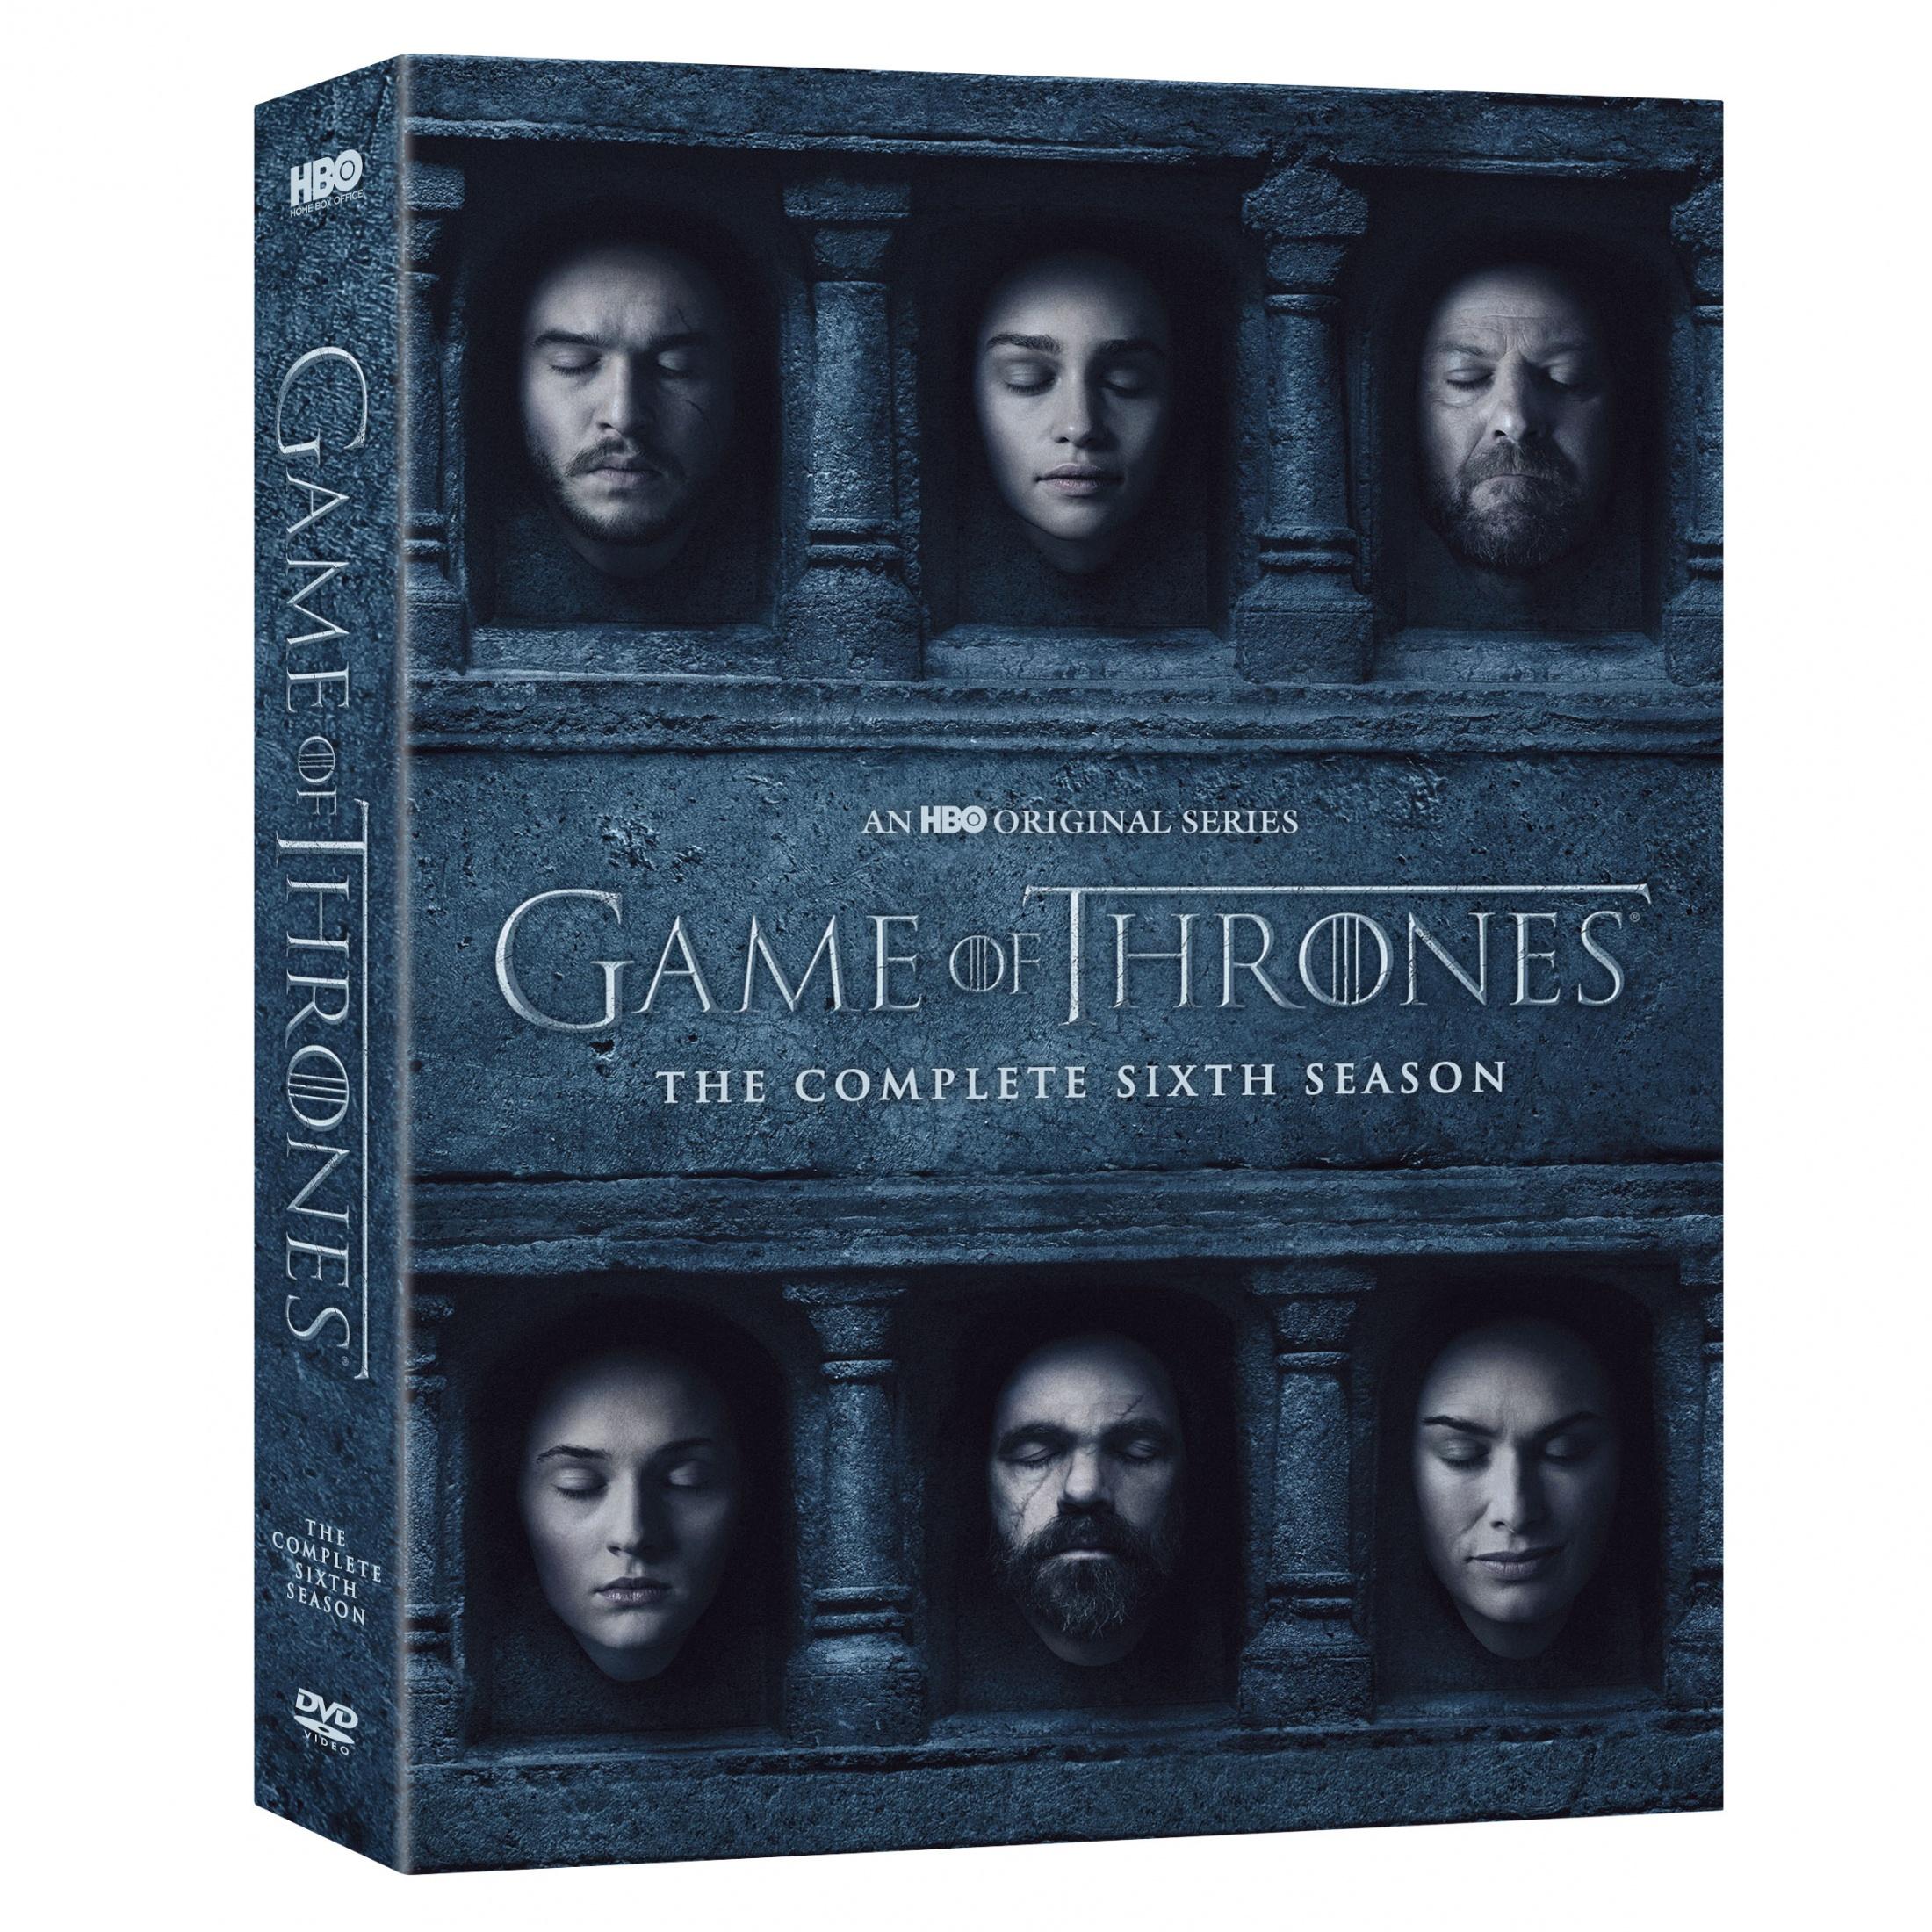 Thumbnail for Game of Thrones 6th Season Blu-ray